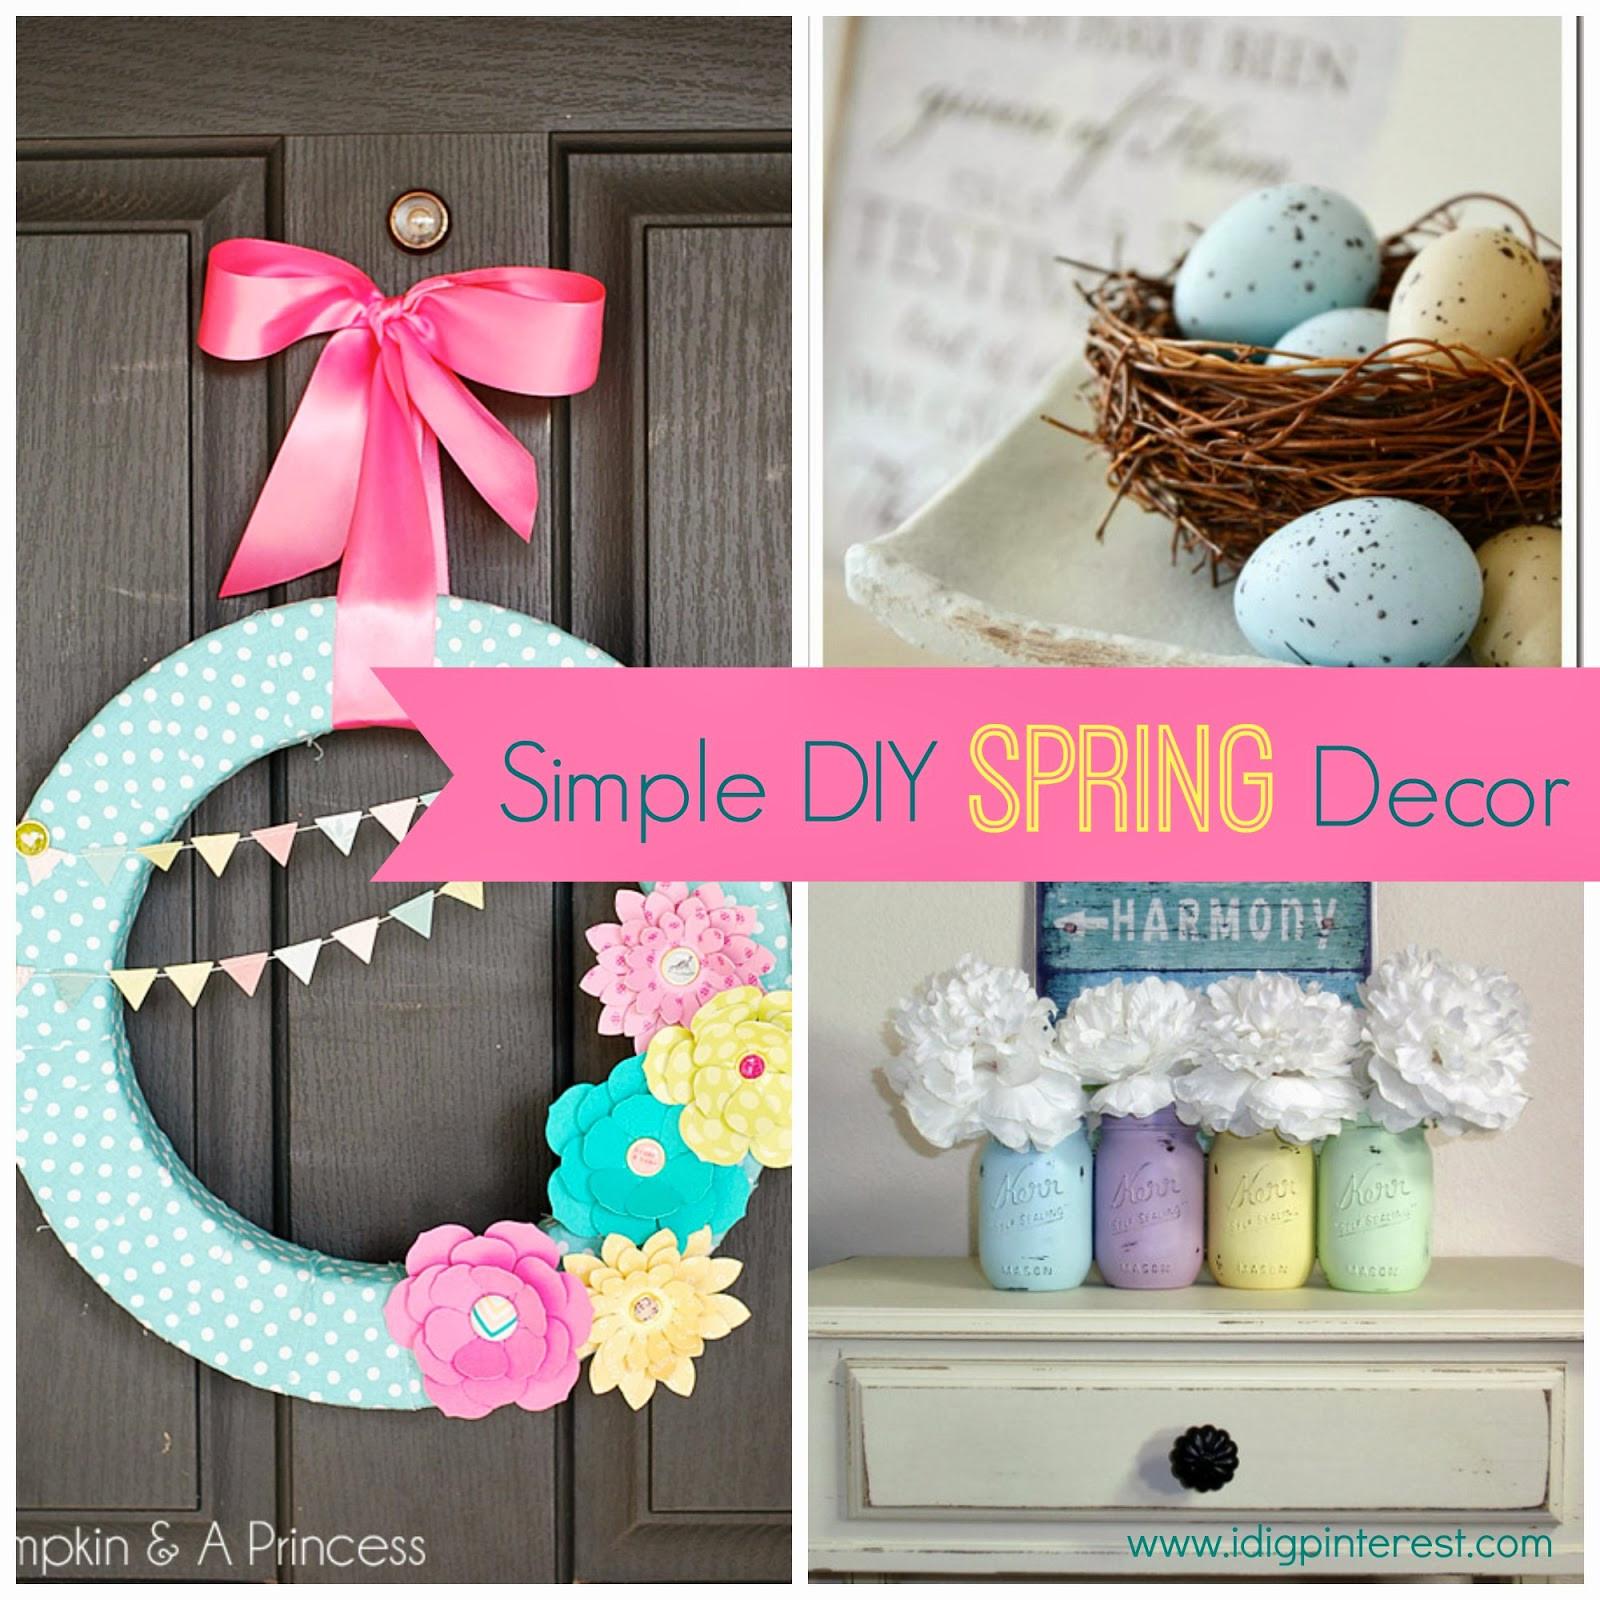 DIY Home Decorating Pinterest  Simple DIY Spring Decor Ideas I Dig Pinterest